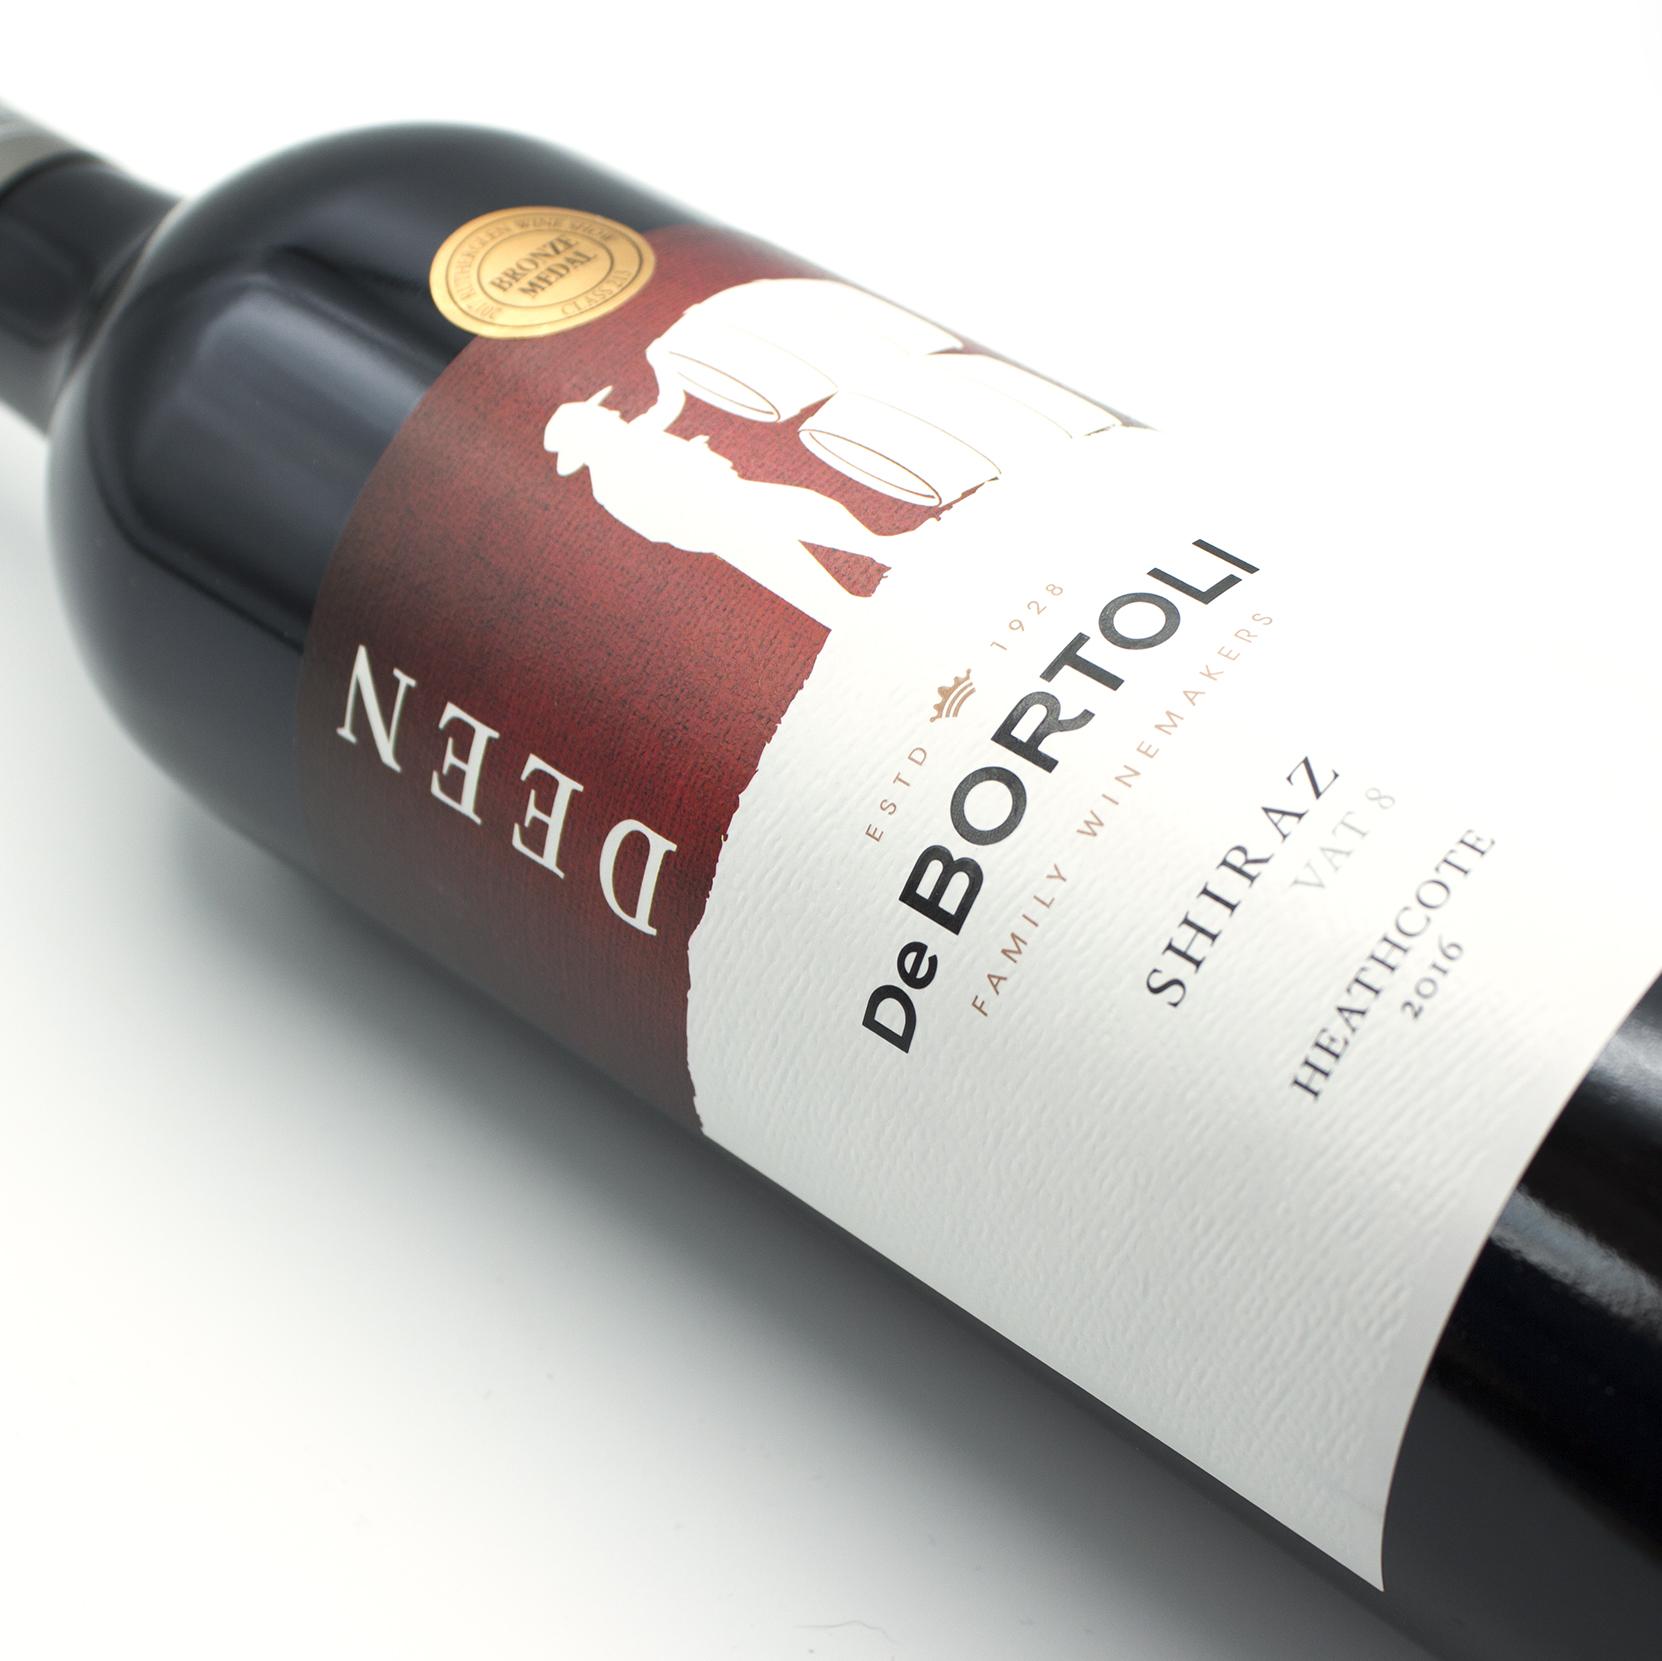 De Bortolie wines Vat 8 Shiraz